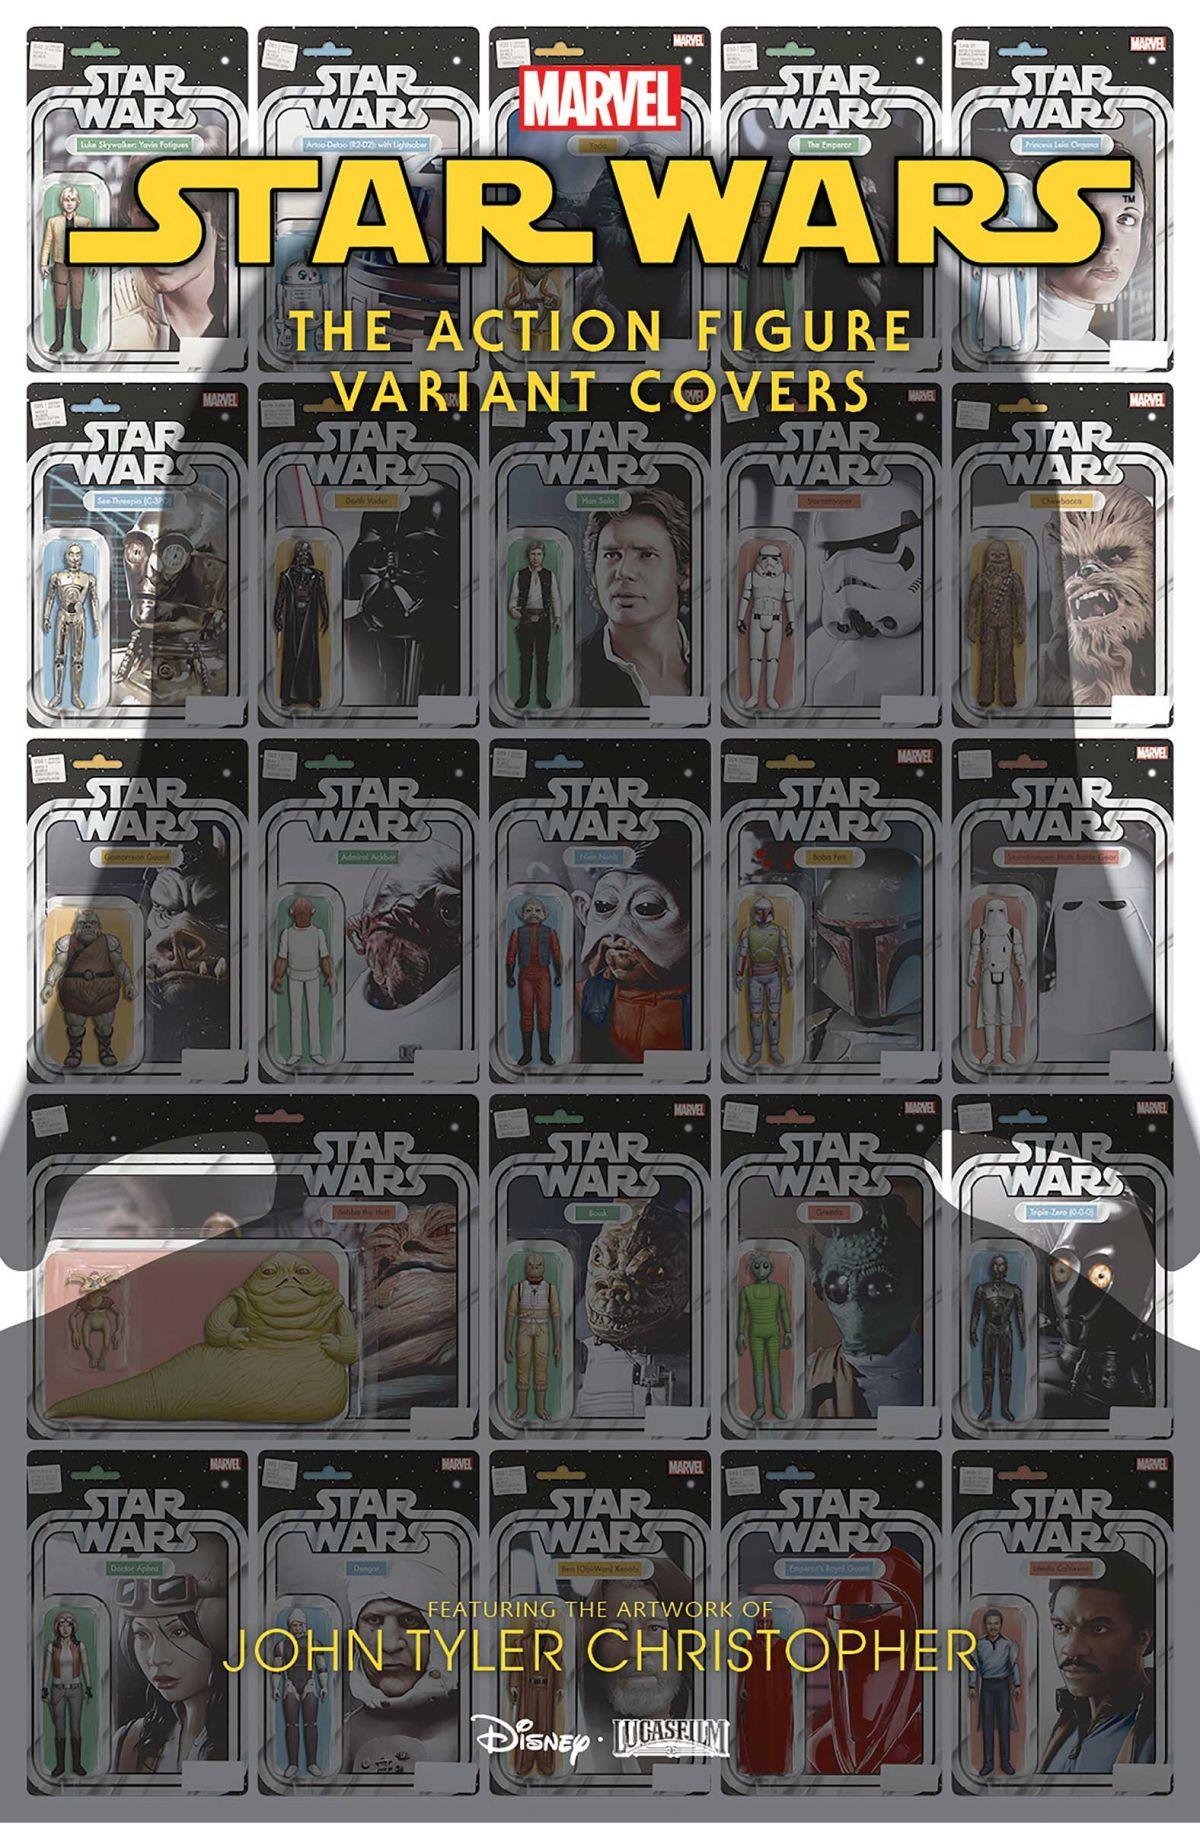 STAR WARS #53 LOGRAY EWOK SHAMAN ACTION FIGURE VARIANT COMIC BOOK